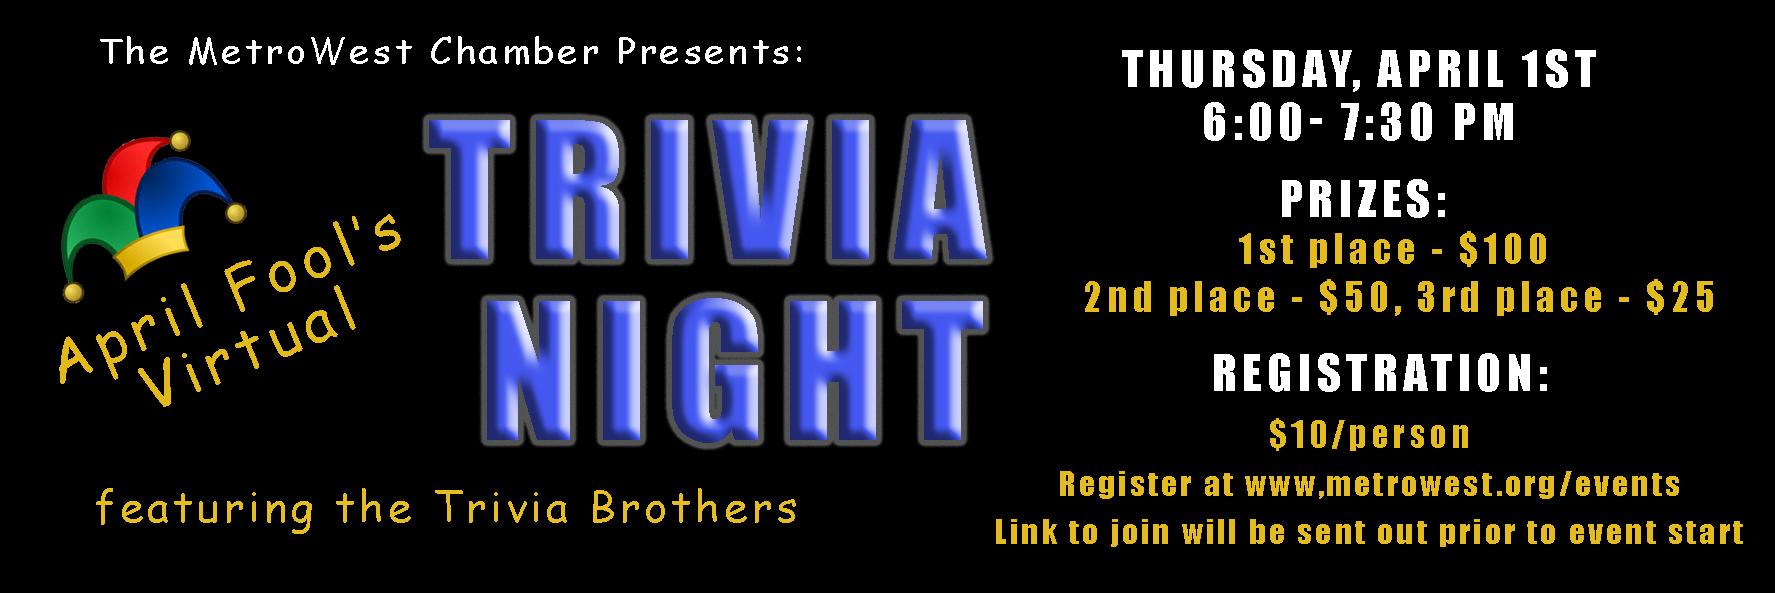 April-Fool's-Trivia-Night-web-slider.jpg